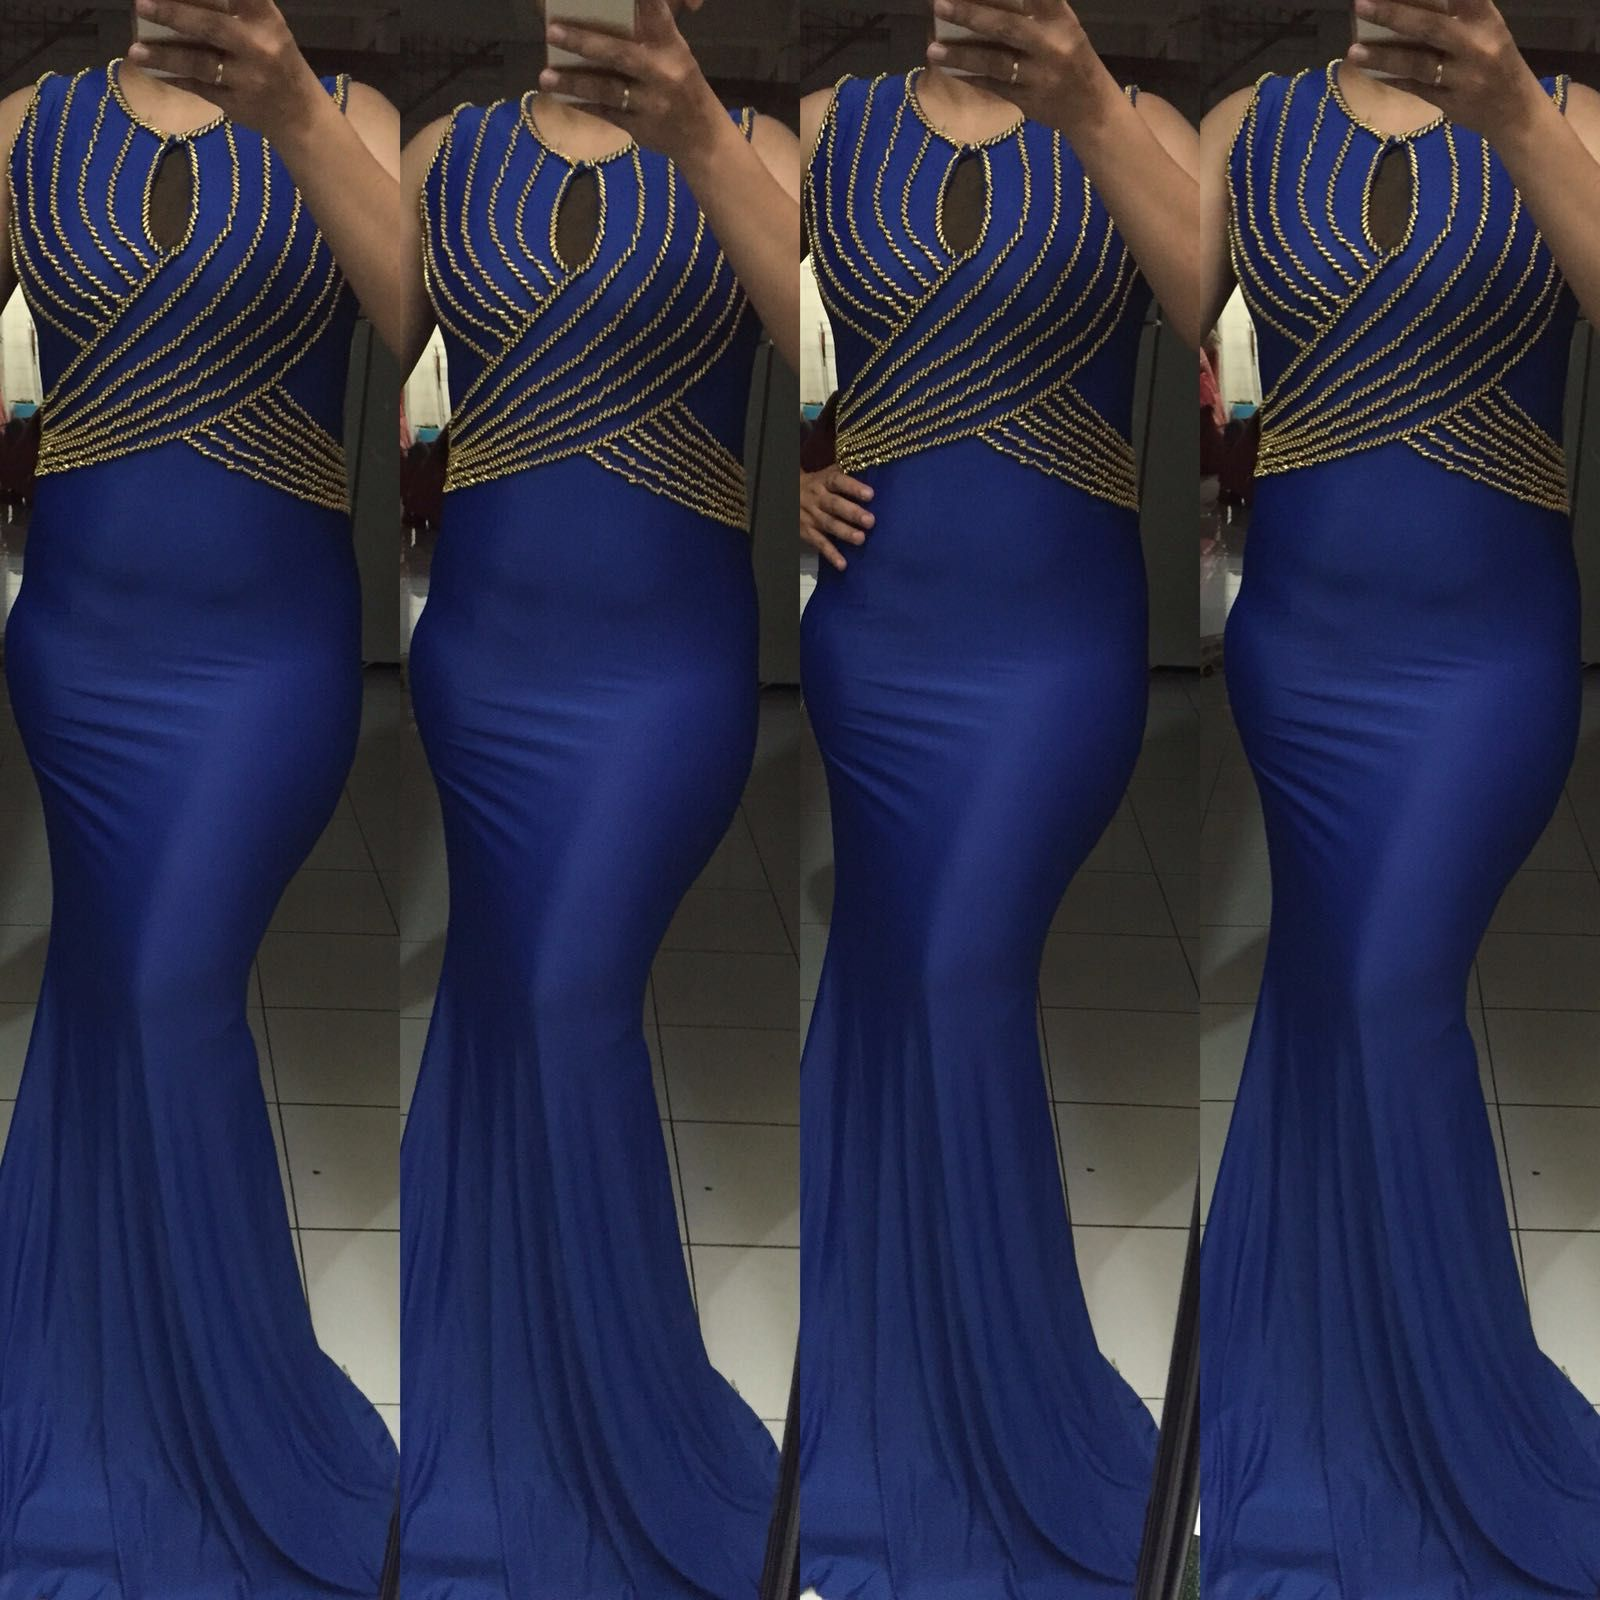 Ladies Long Kaftan Blue Spandex Dress Online Sale //Price: $140.81 & FREE Shipping //    #fashiongirl #fashionlovers #fashionmodel #outfit